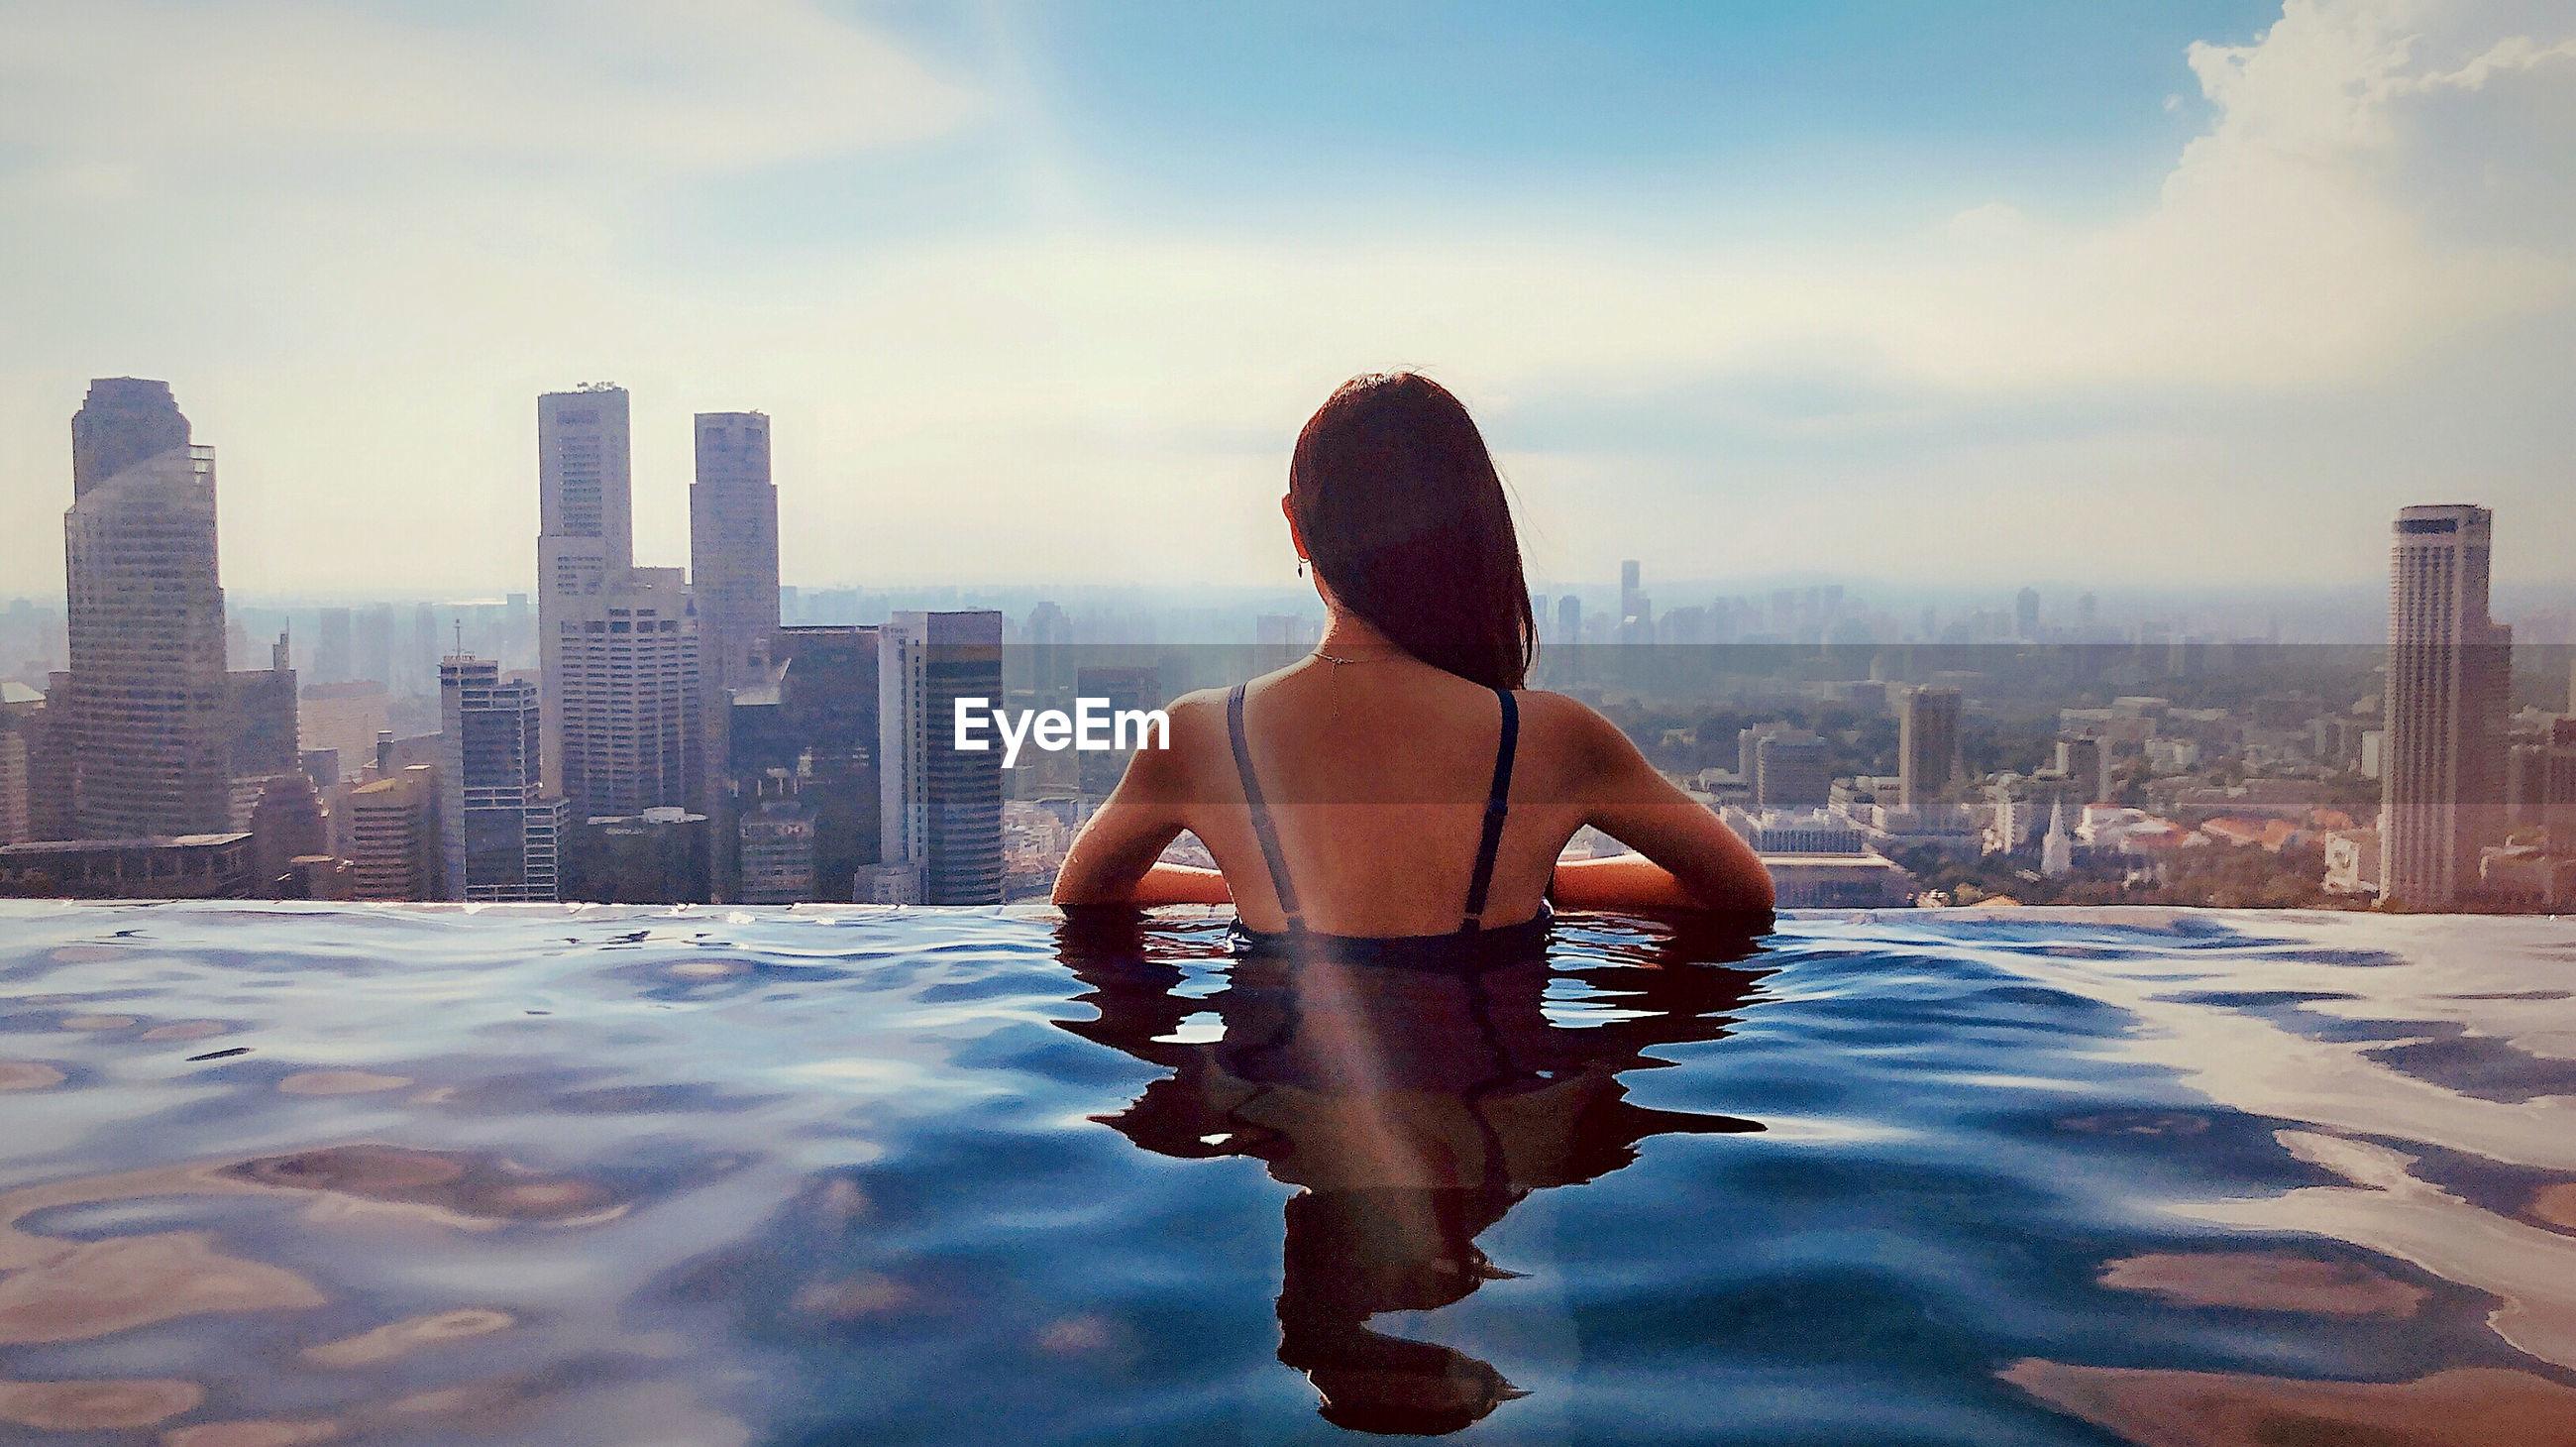 Rear view of woman in infinity pool against buildings in city